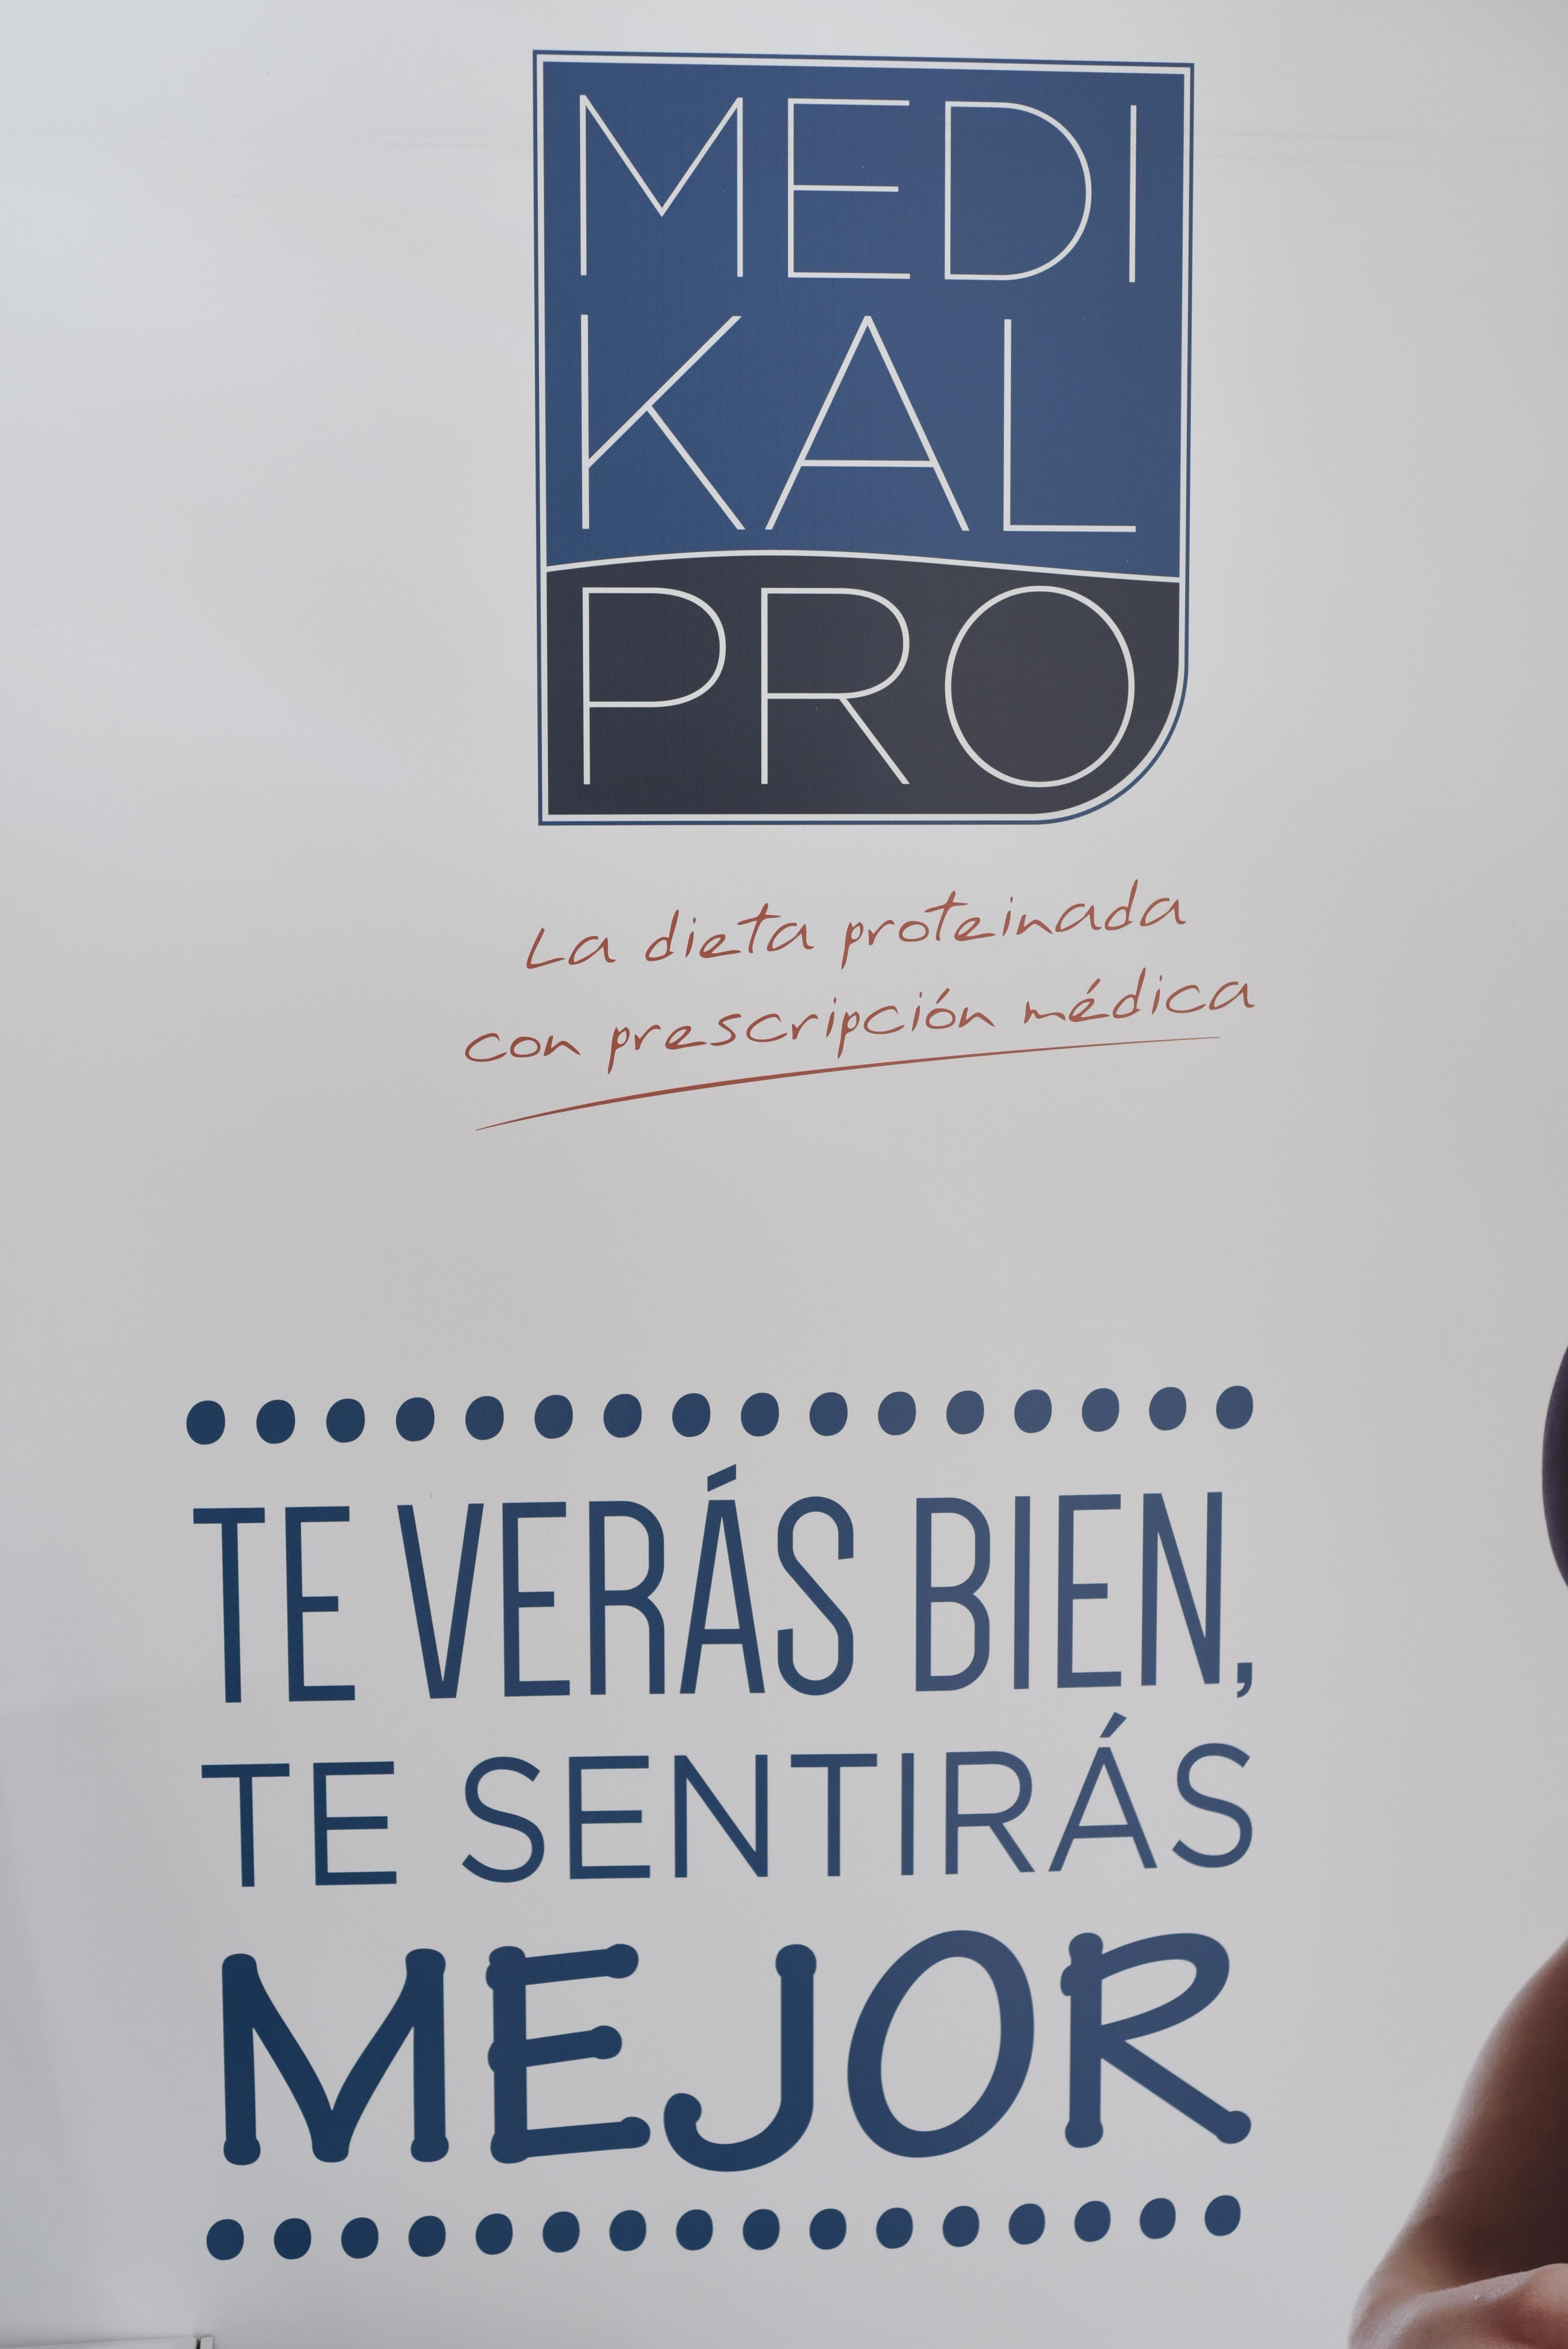 Medikal Pro